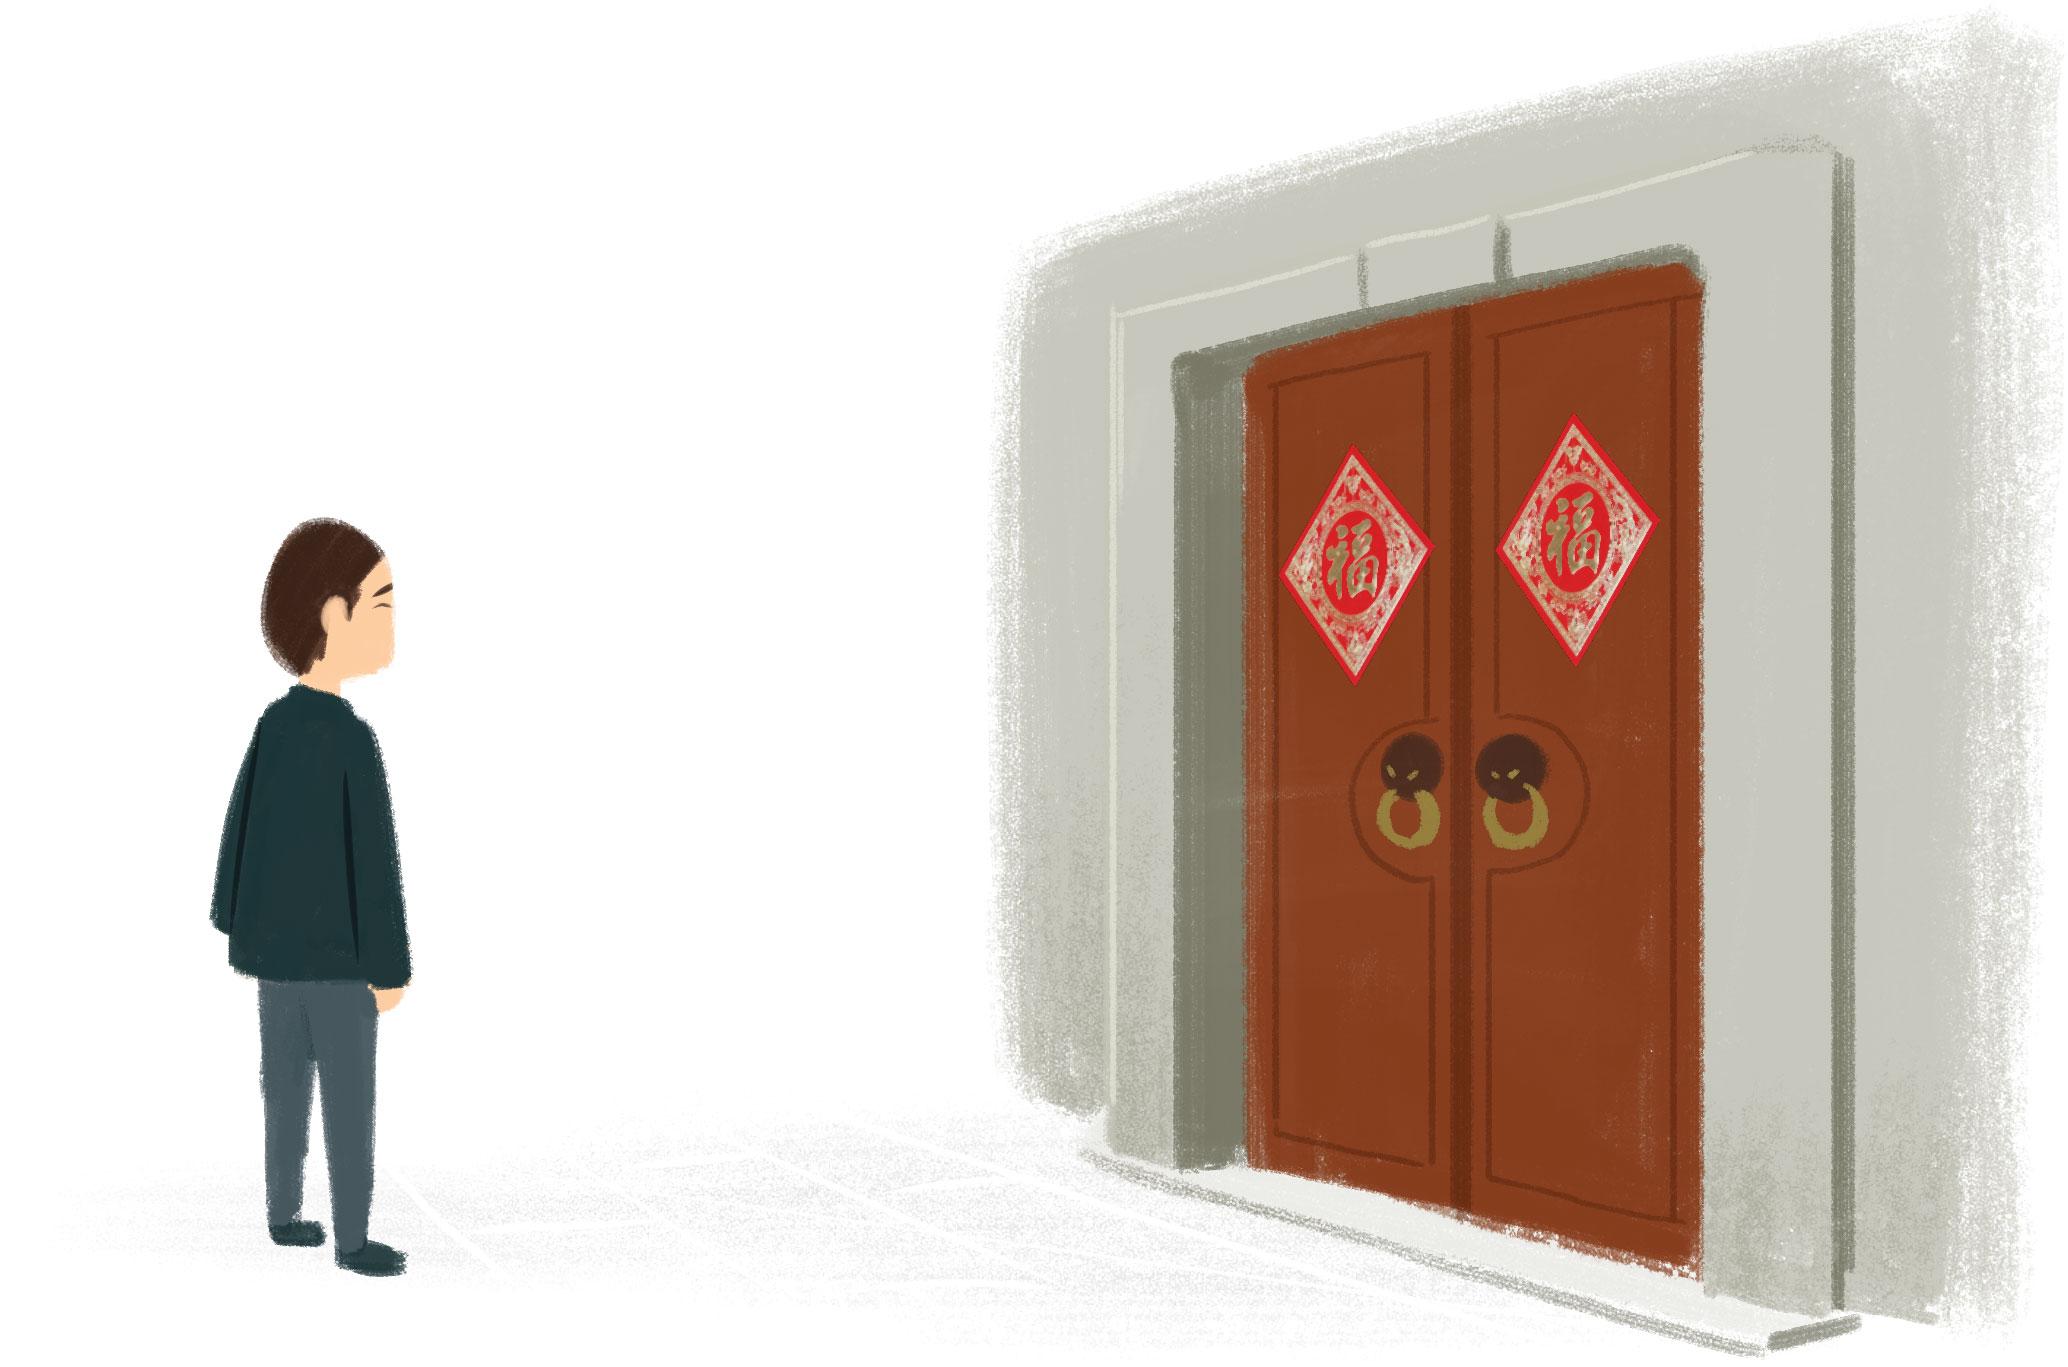 门前 mén qián —Delante de la puerta